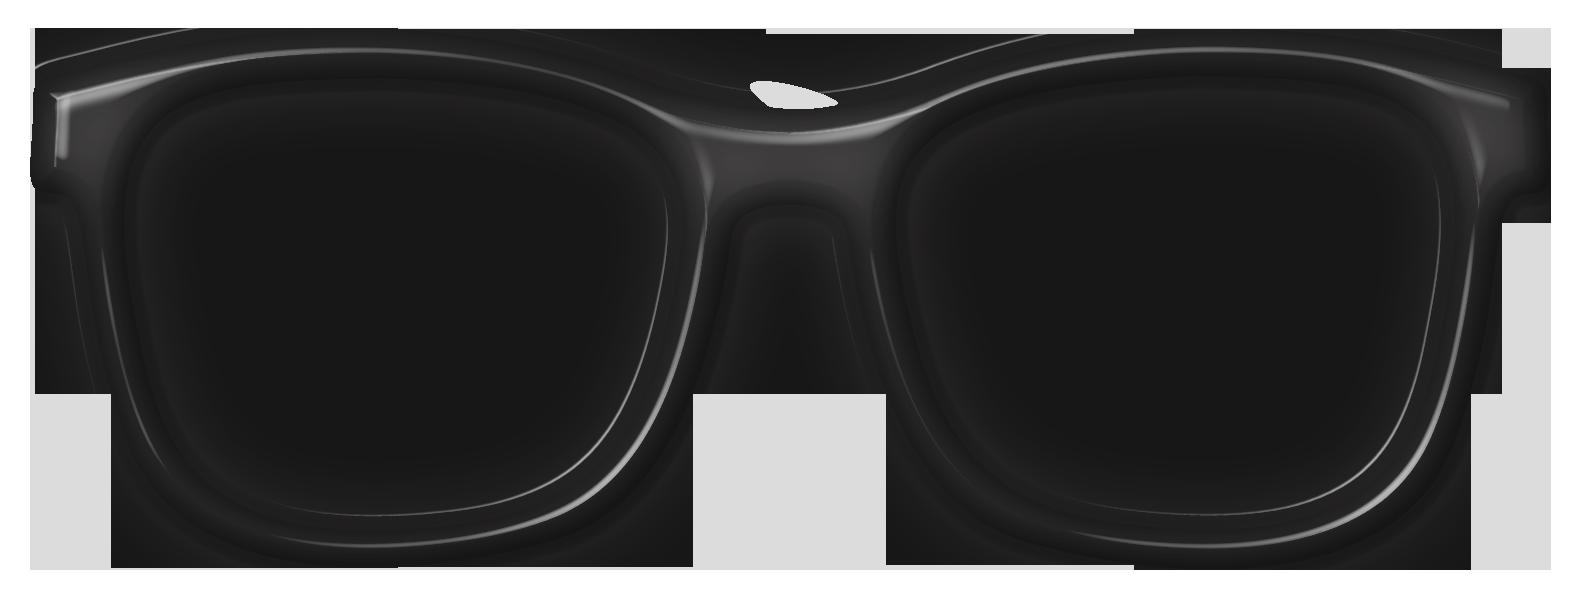 Eyeglasses clipart wayfarer glass. Sunglasses eyewear optics ray